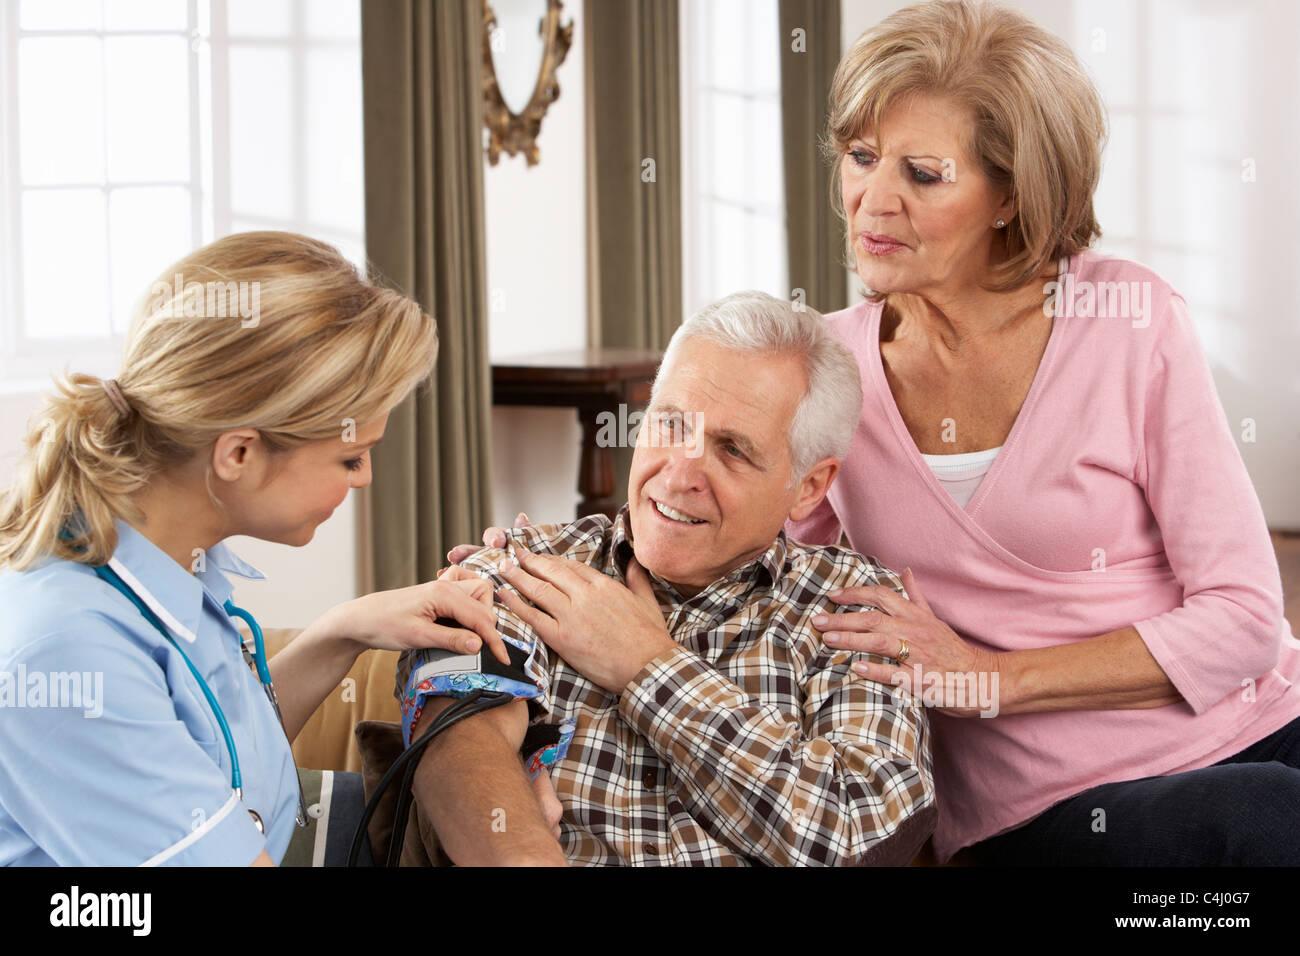 Health Visitor Taking Senior Man's Blood Pressure - Stock Image